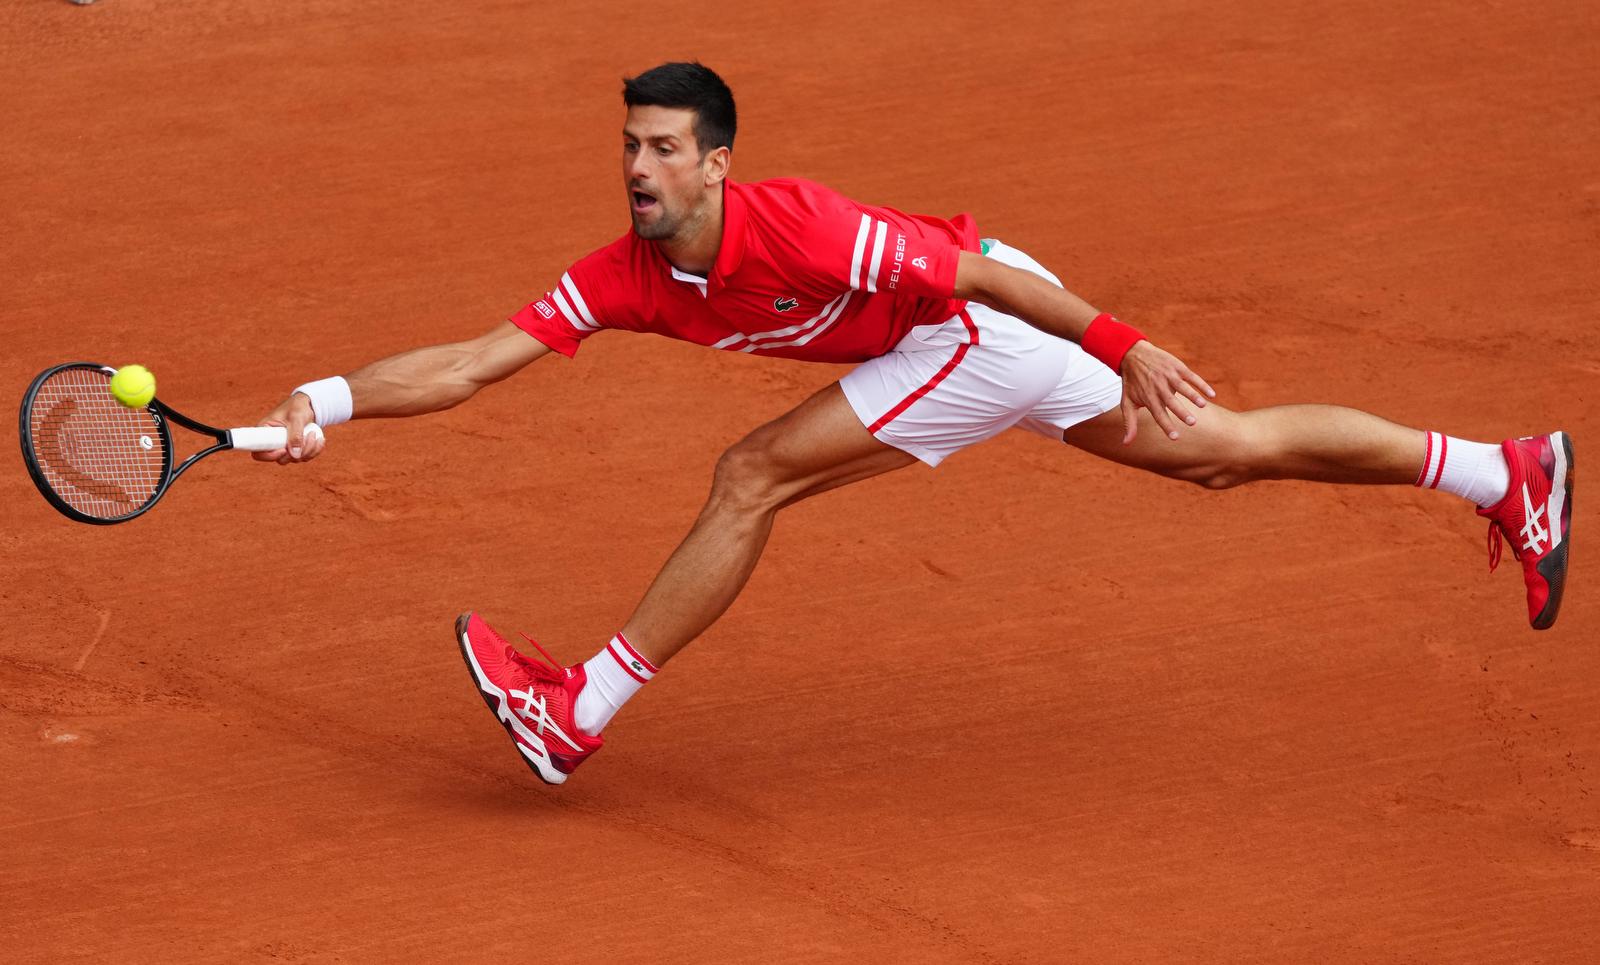 Novak Djokovic returns the ball during the men's singles third round match between Novak Djokovic of Serbia and Ricardas Berankis of Lithuania at the French Open tennis tournament at Roland Garros in Paris, France, June 5, 2021. Xinhua